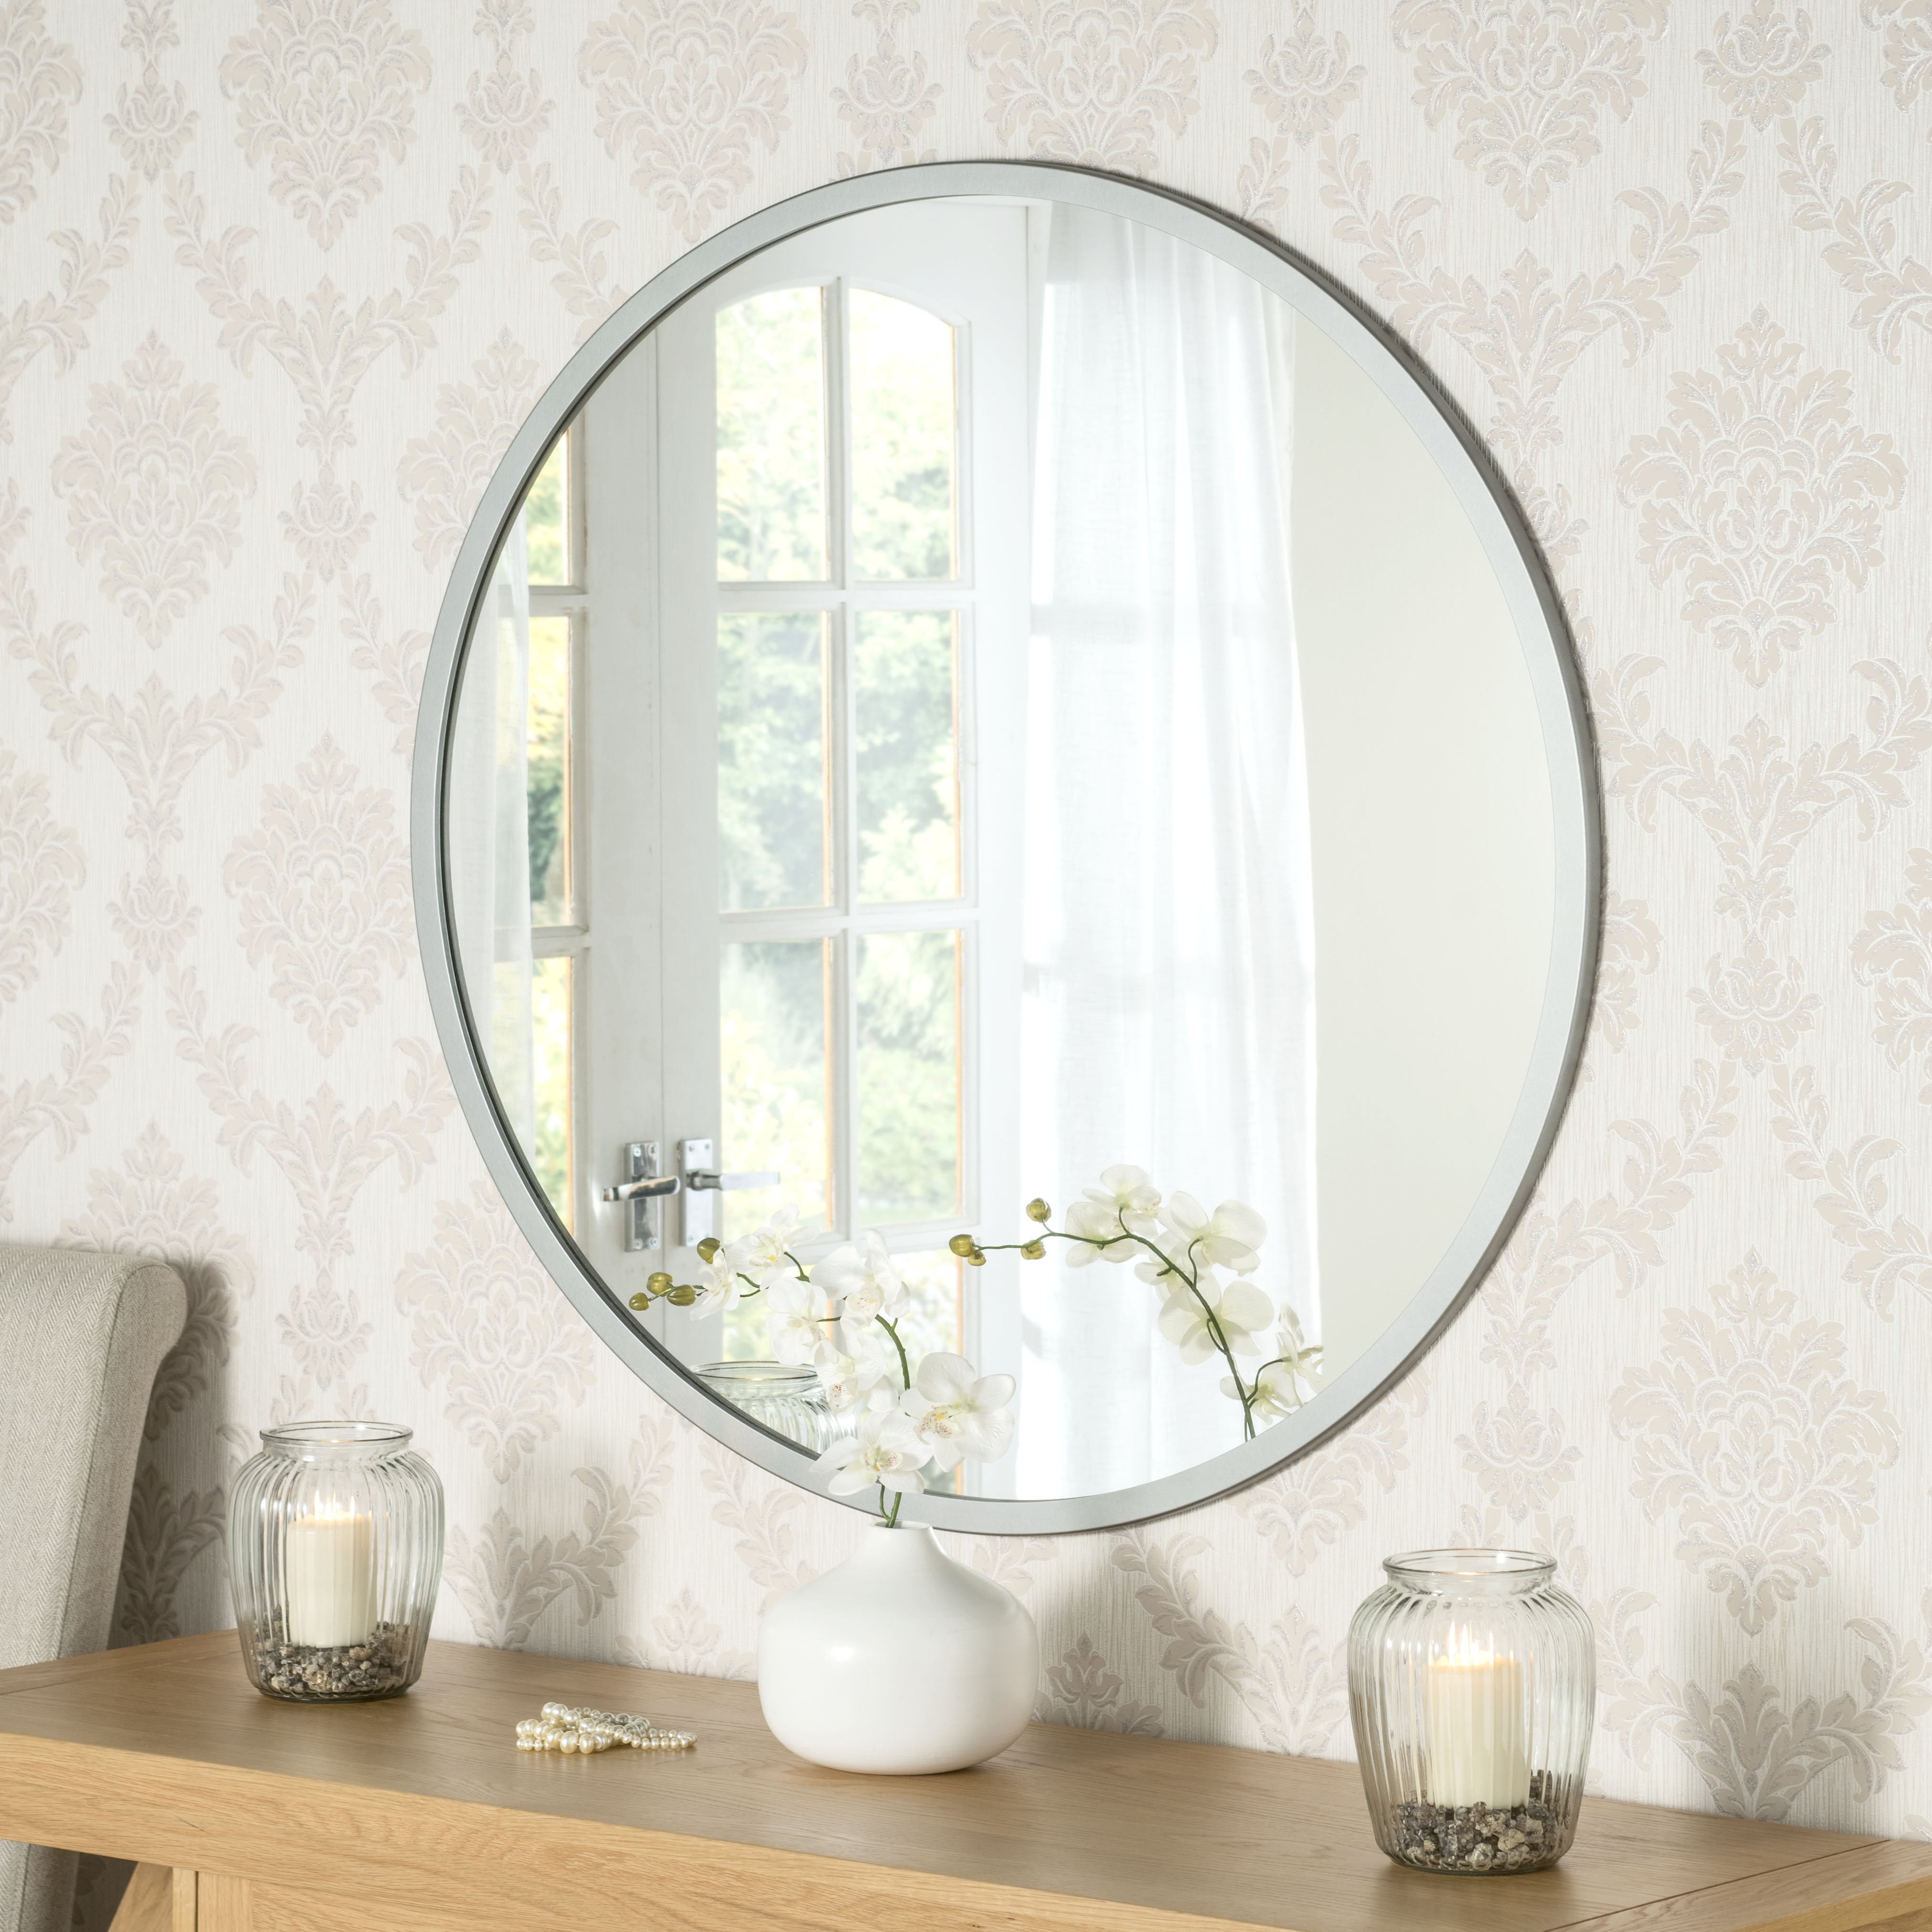 Buy Decorative Mirrors Online Bespoke Mirrors Amor Decor